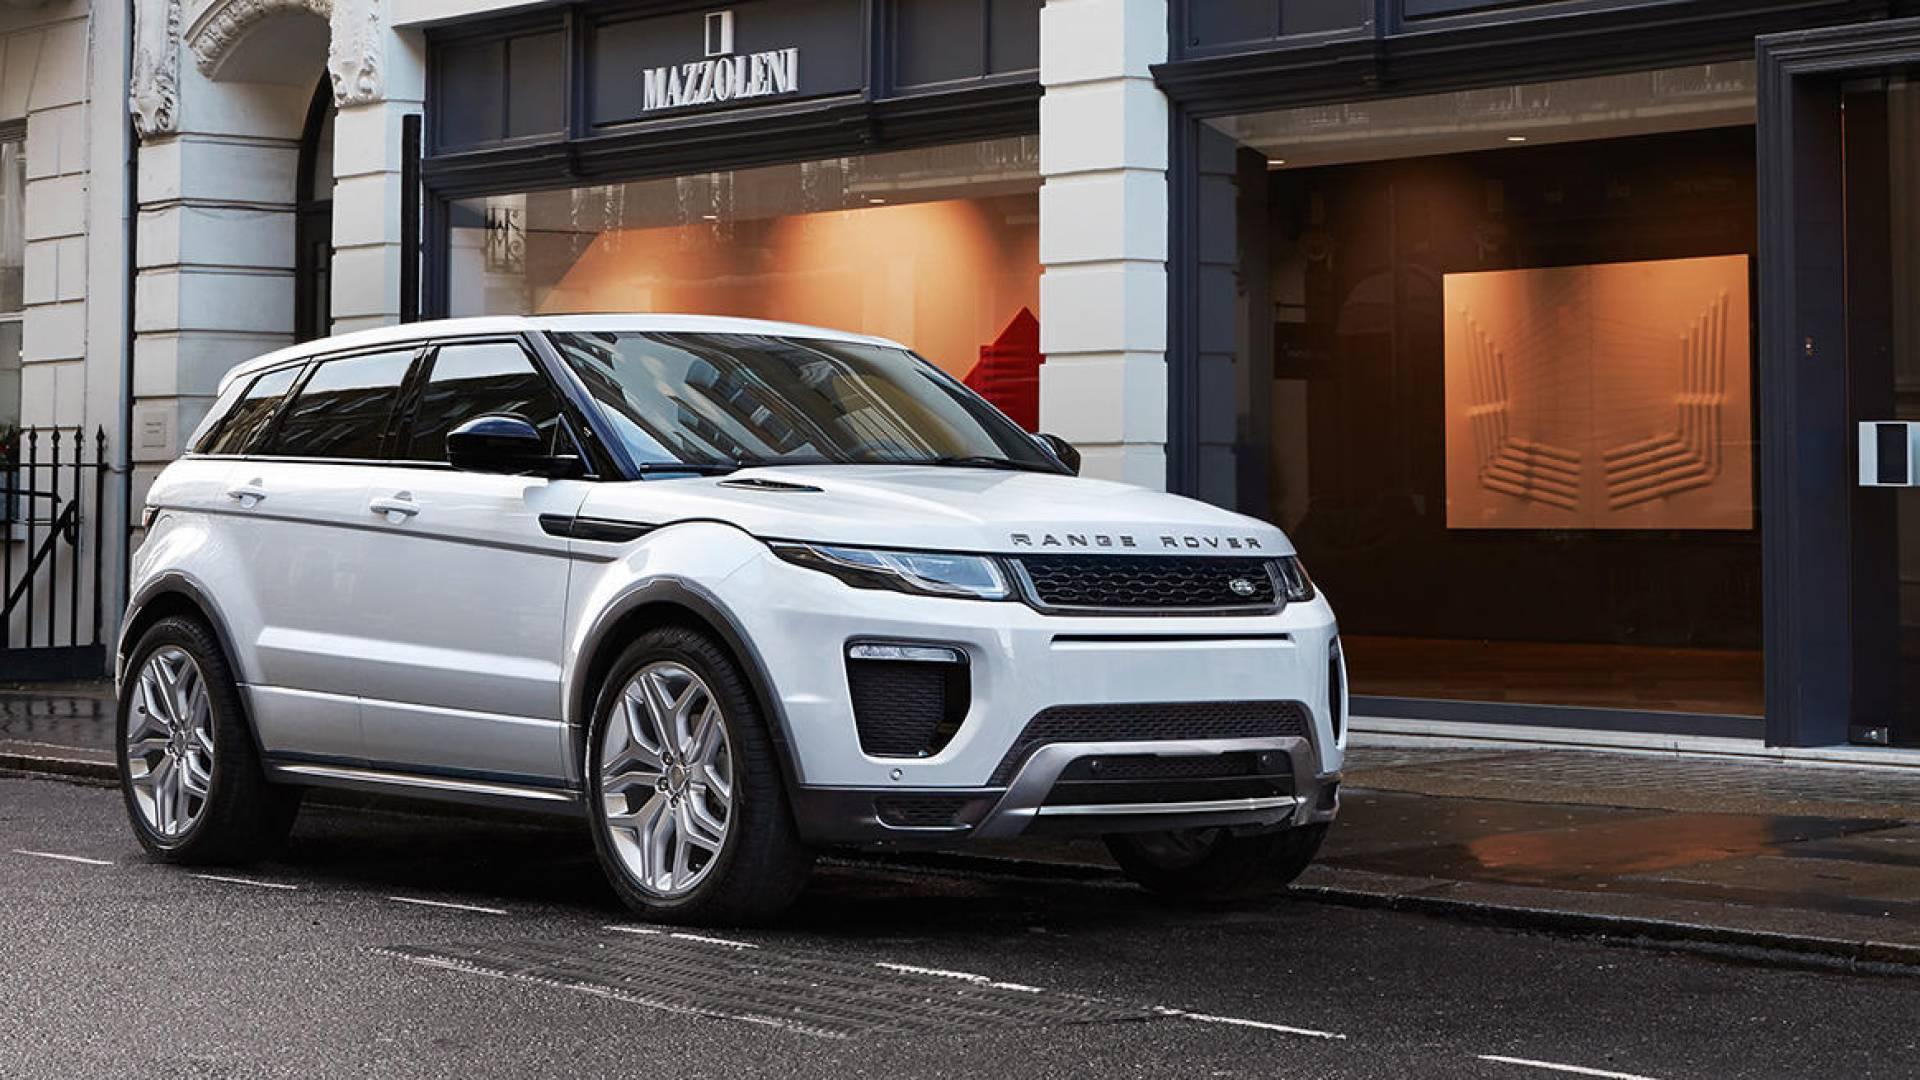 Range Rover Evoque y Evoque Coupé precios prueba ficha técnica